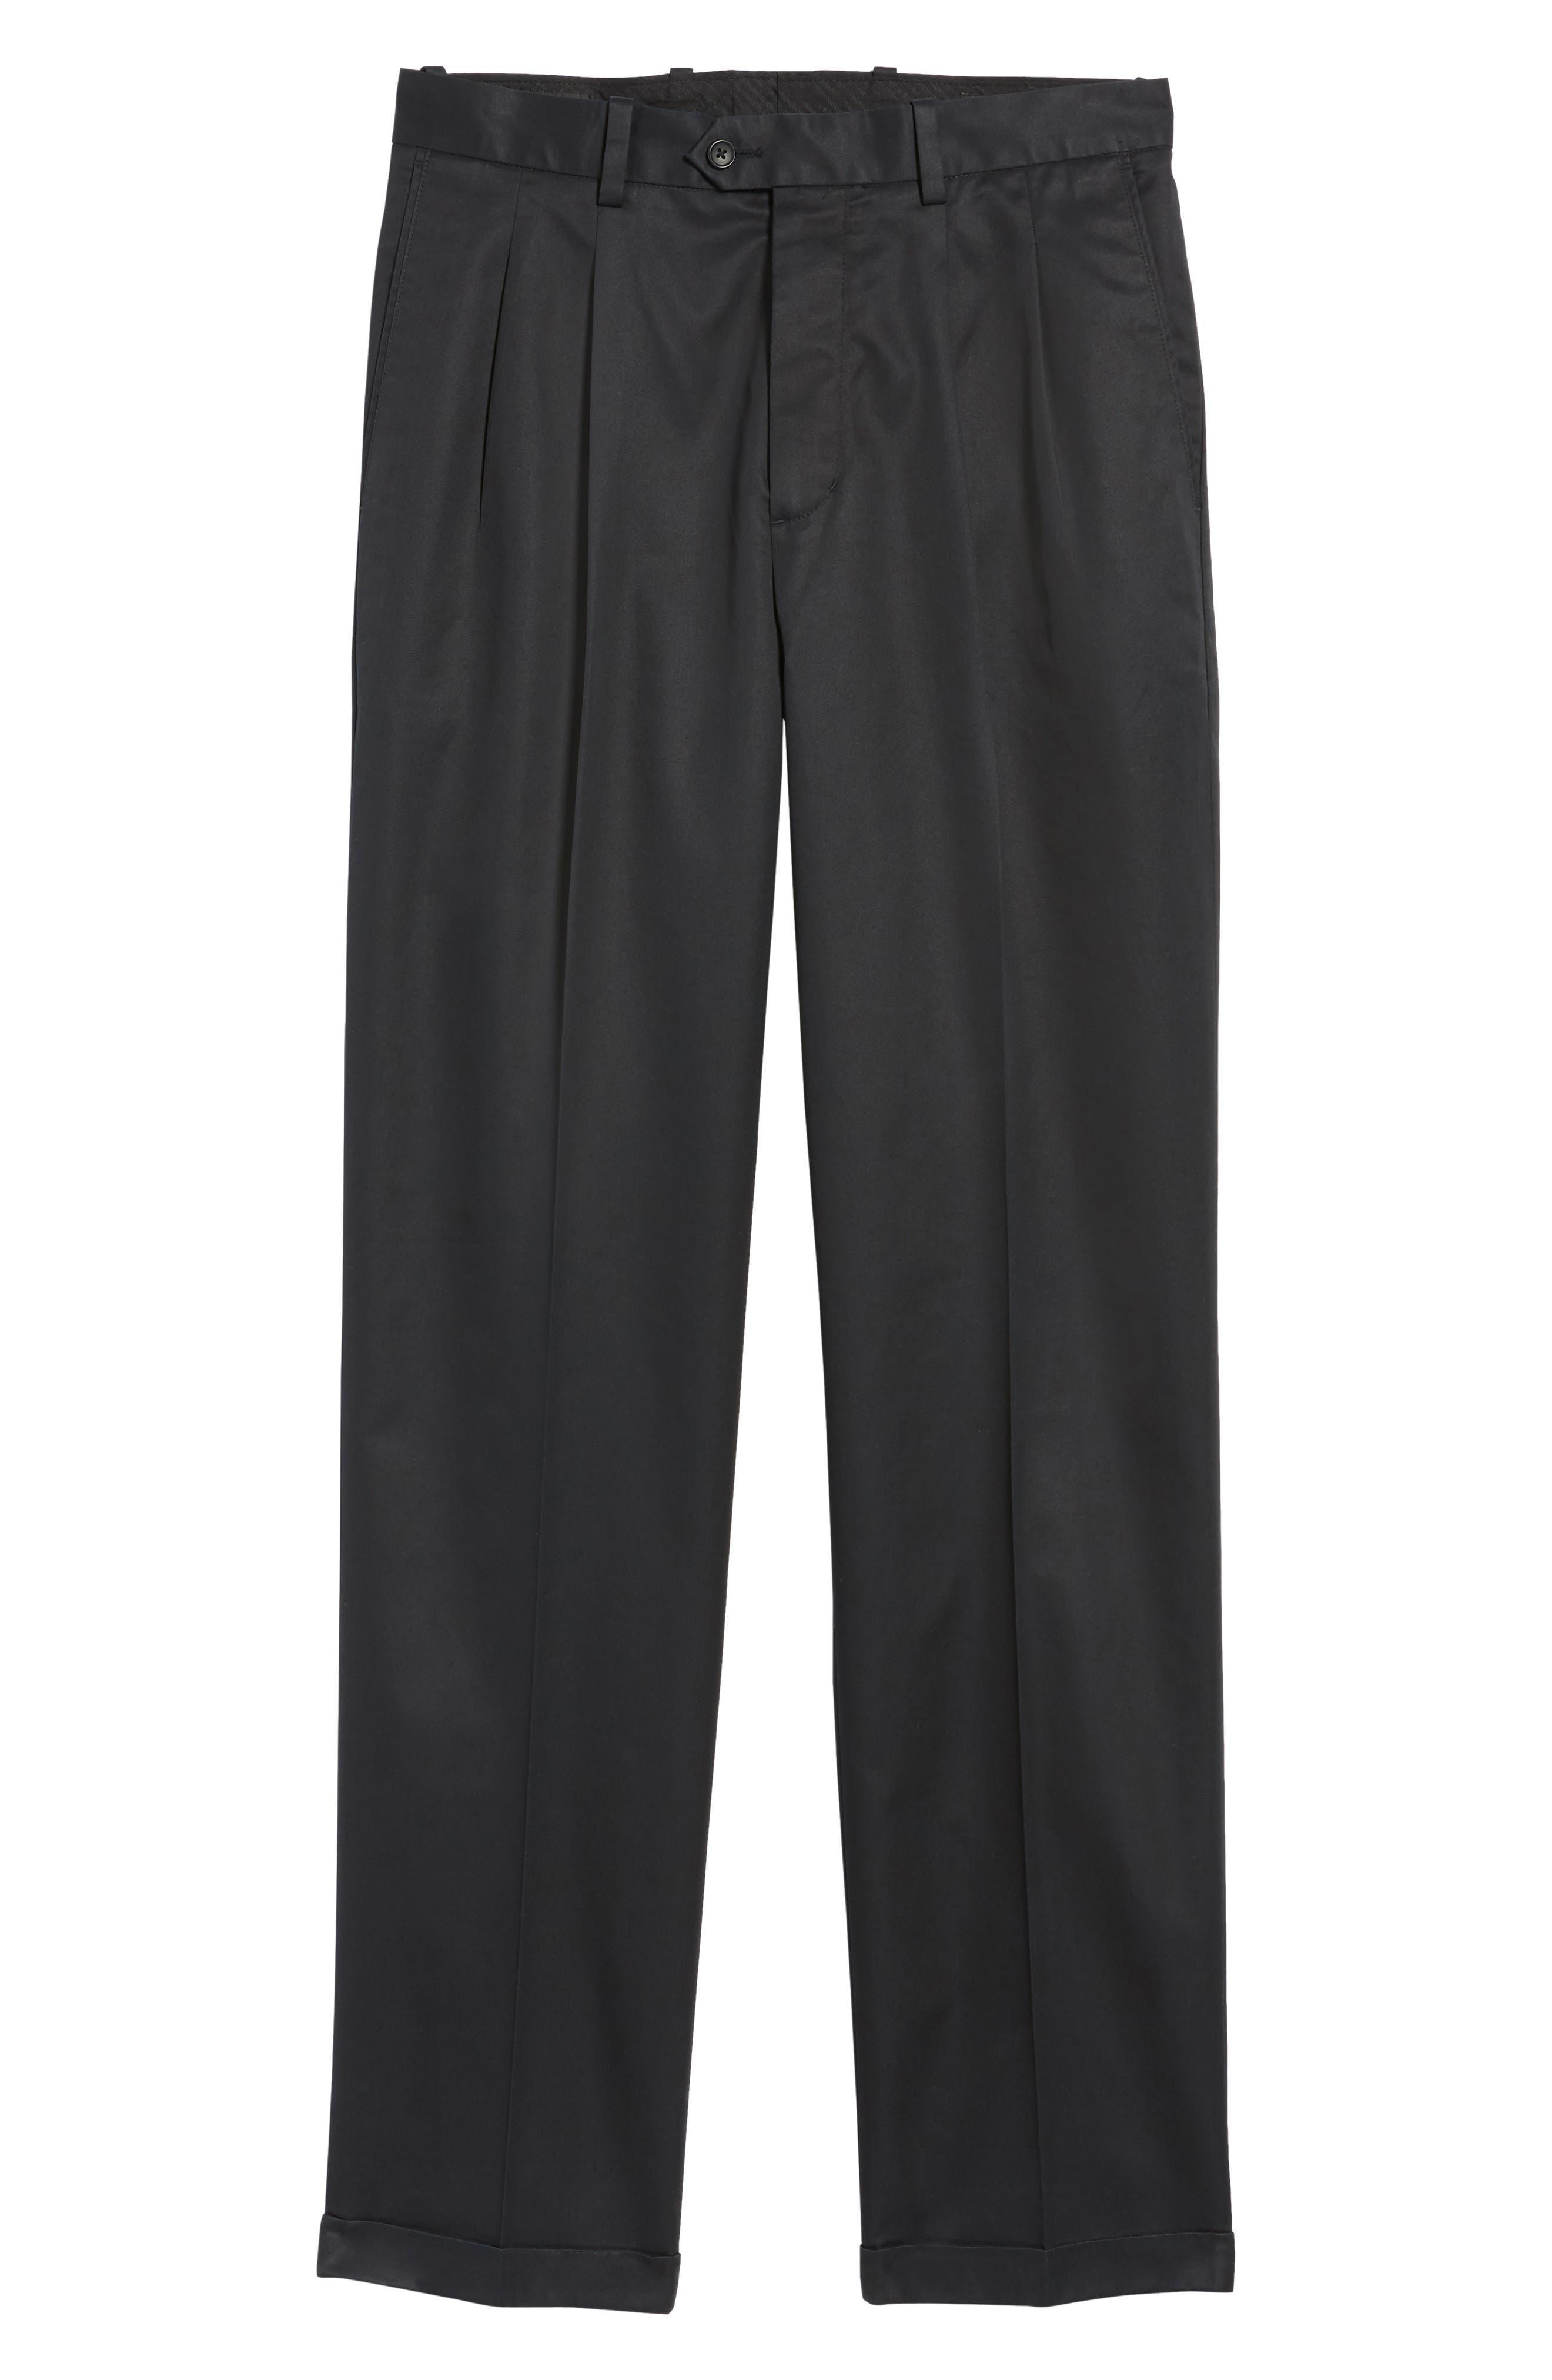 Classic Smartcare<sup>™</sup> Supima<sup>®</sup> Cotton Pleated Trousers,                             Alternate thumbnail 2, color,                             BLACK CAVIAR